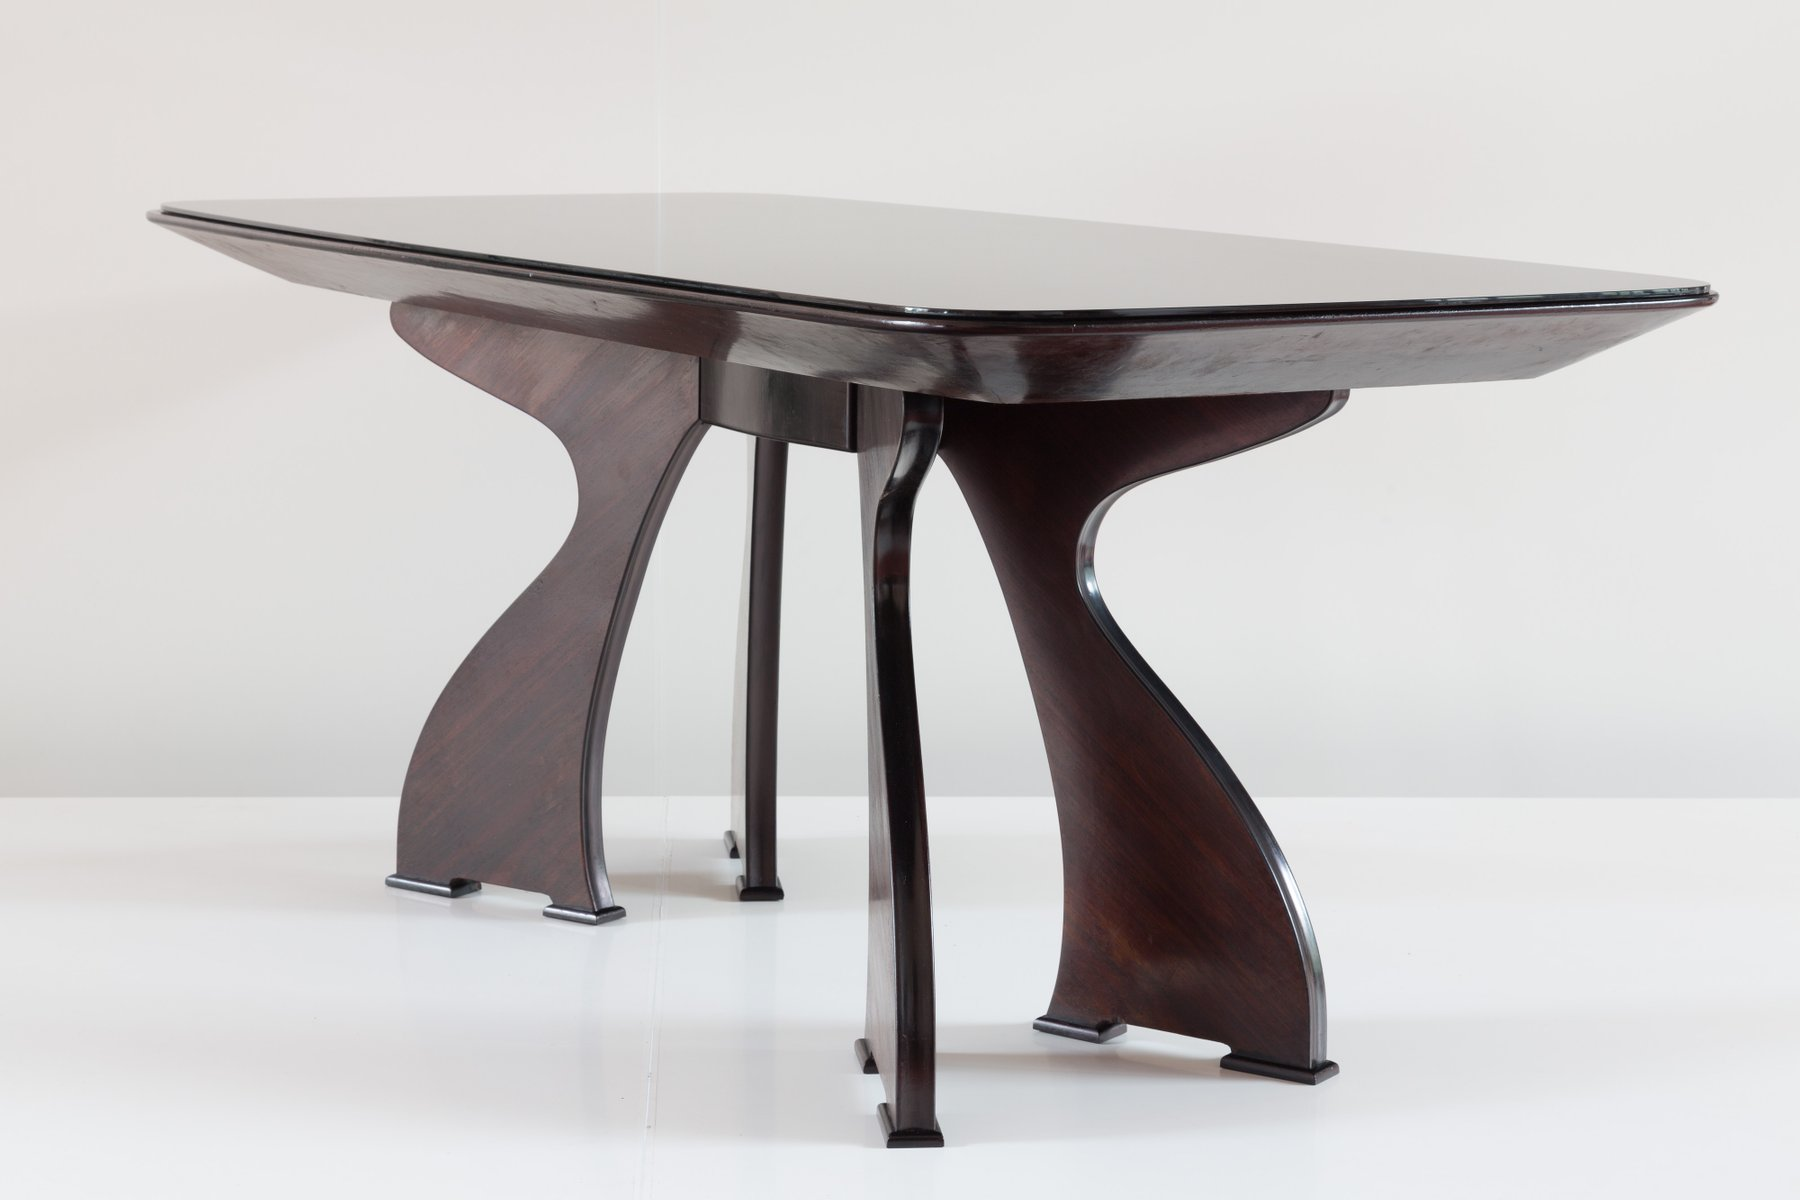 Sculptural italian modern rosewood dining table for sale for Dining tables for sale